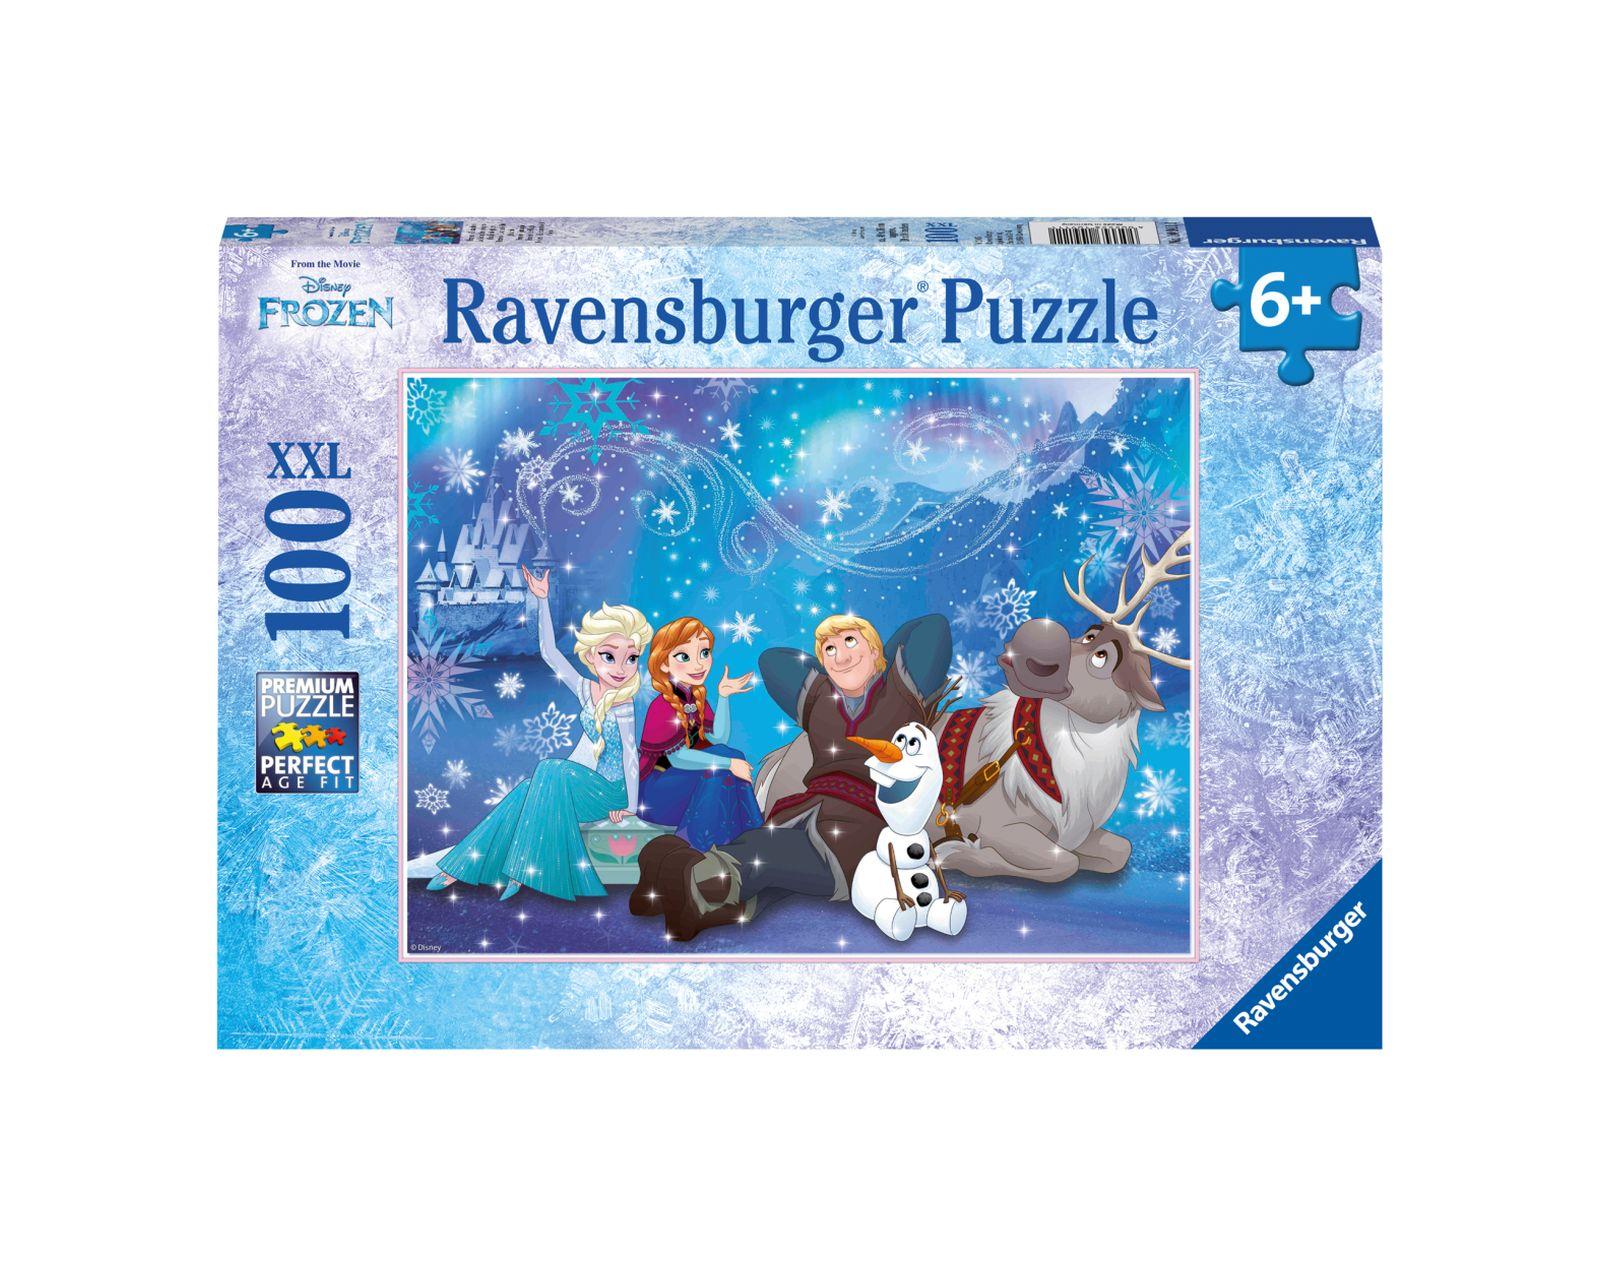 Ravensburger - puzzle 100 pezzi xxl - frozen c - Ravensburger1